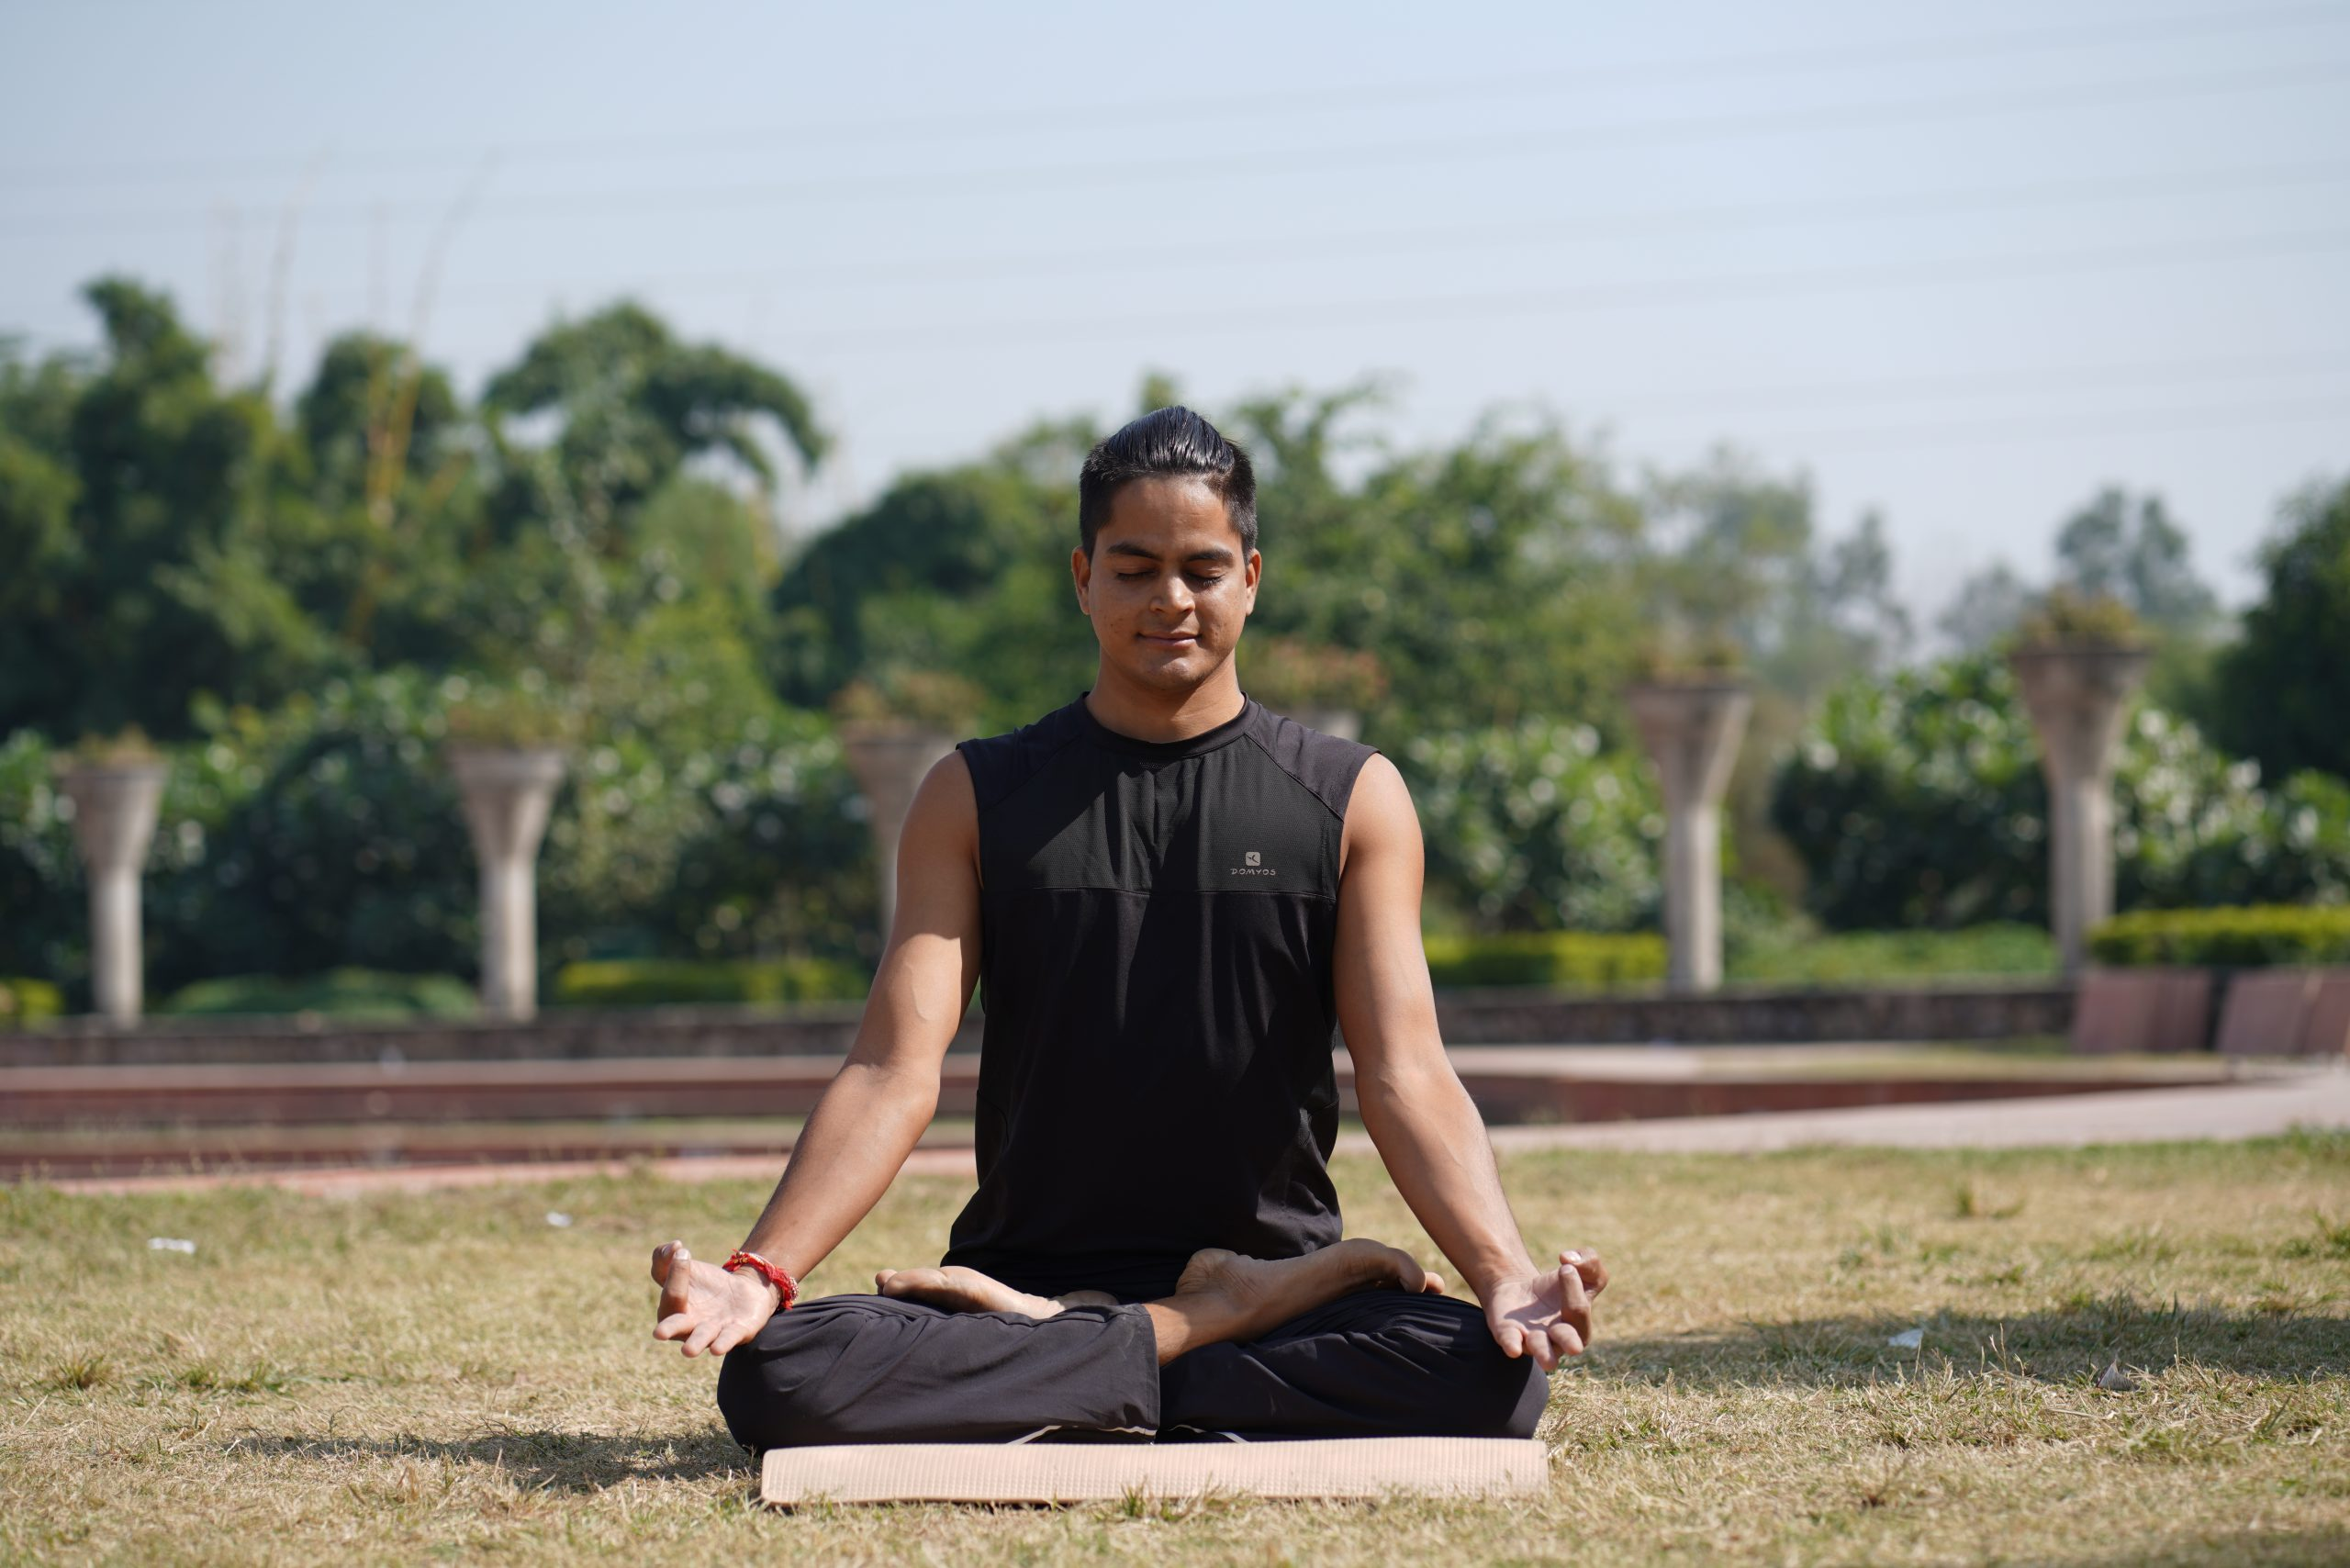 A yoga boy